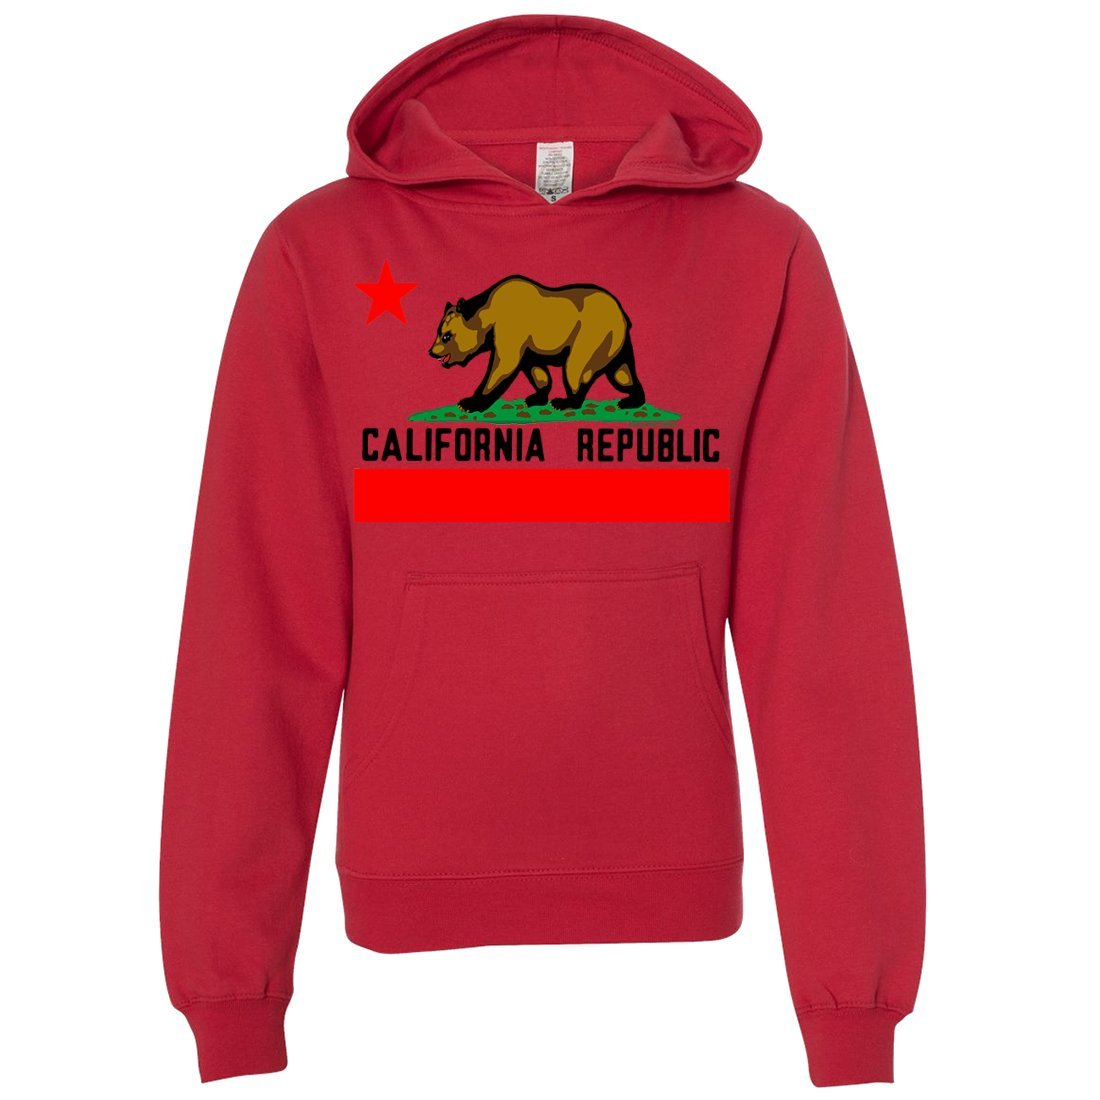 Dolphin Shirt Co California Republic Borderless Bear Flag Black Text Youth Sweatshirt Hoodie